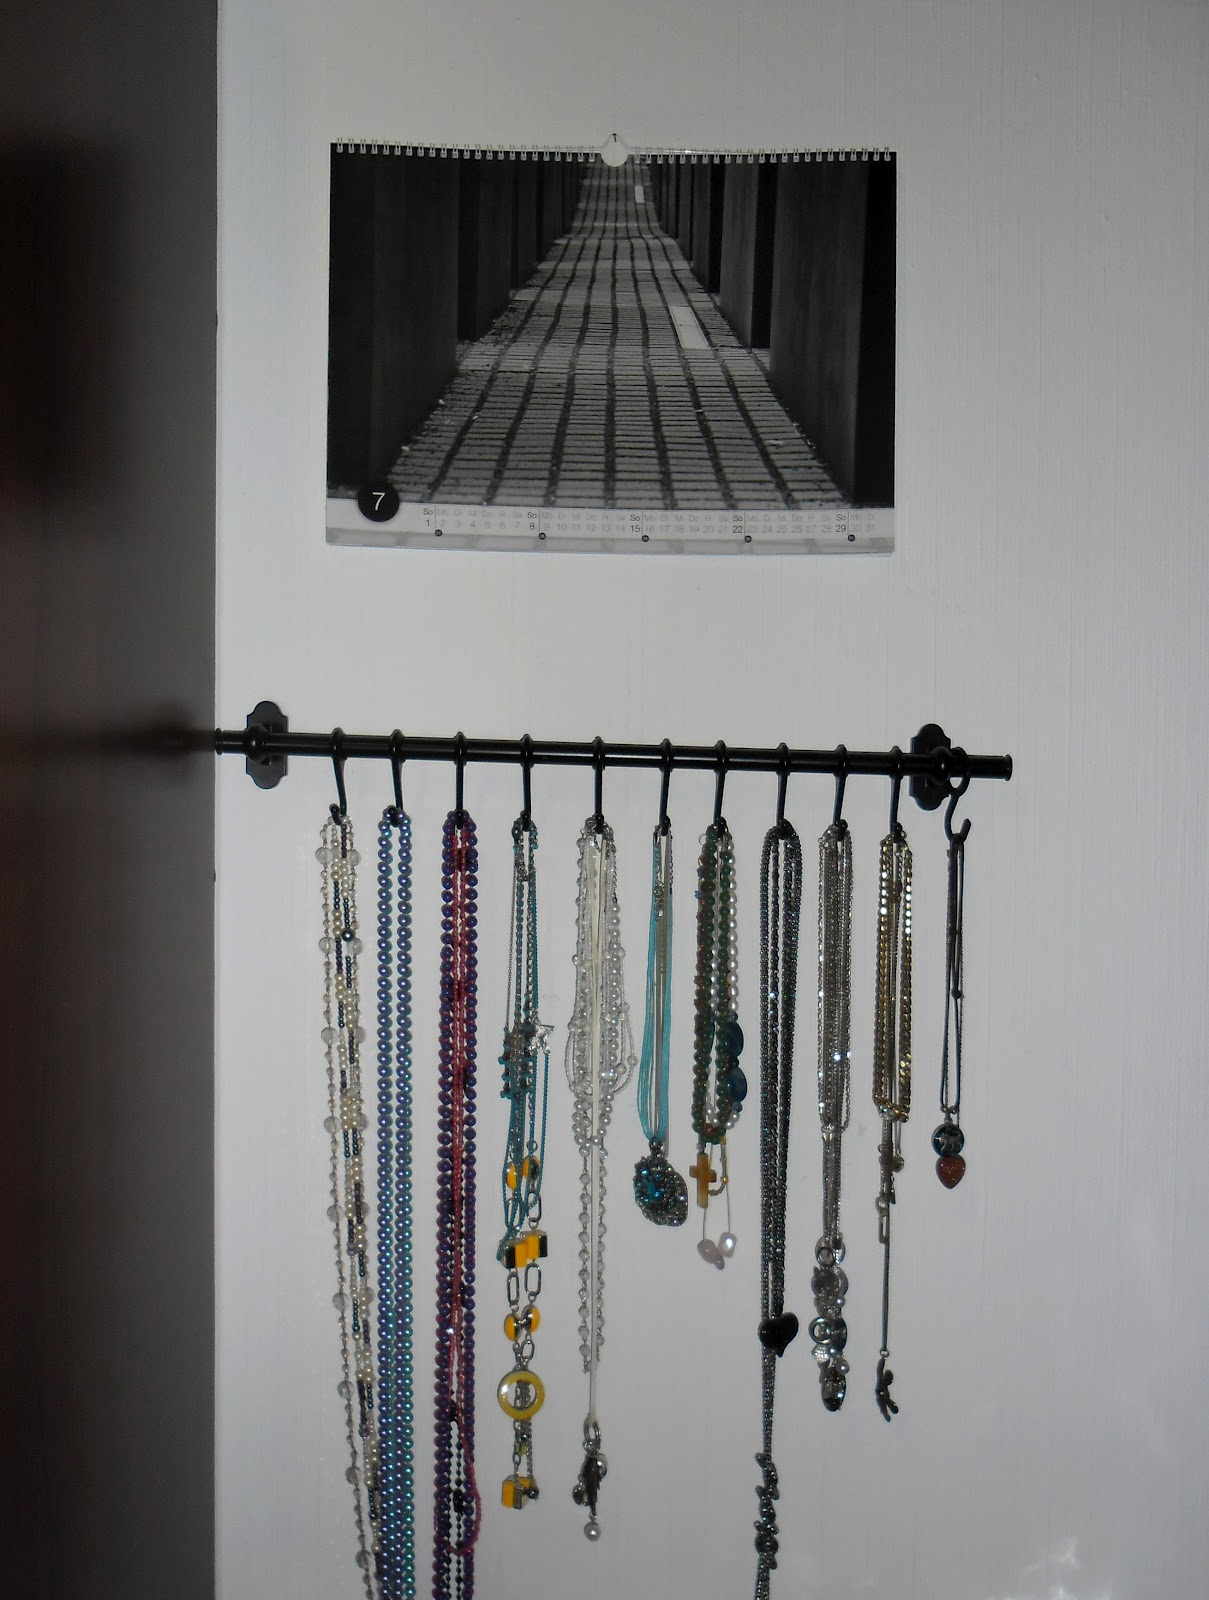 mrs cranberry schmuckaufbewahrung. Black Bedroom Furniture Sets. Home Design Ideas